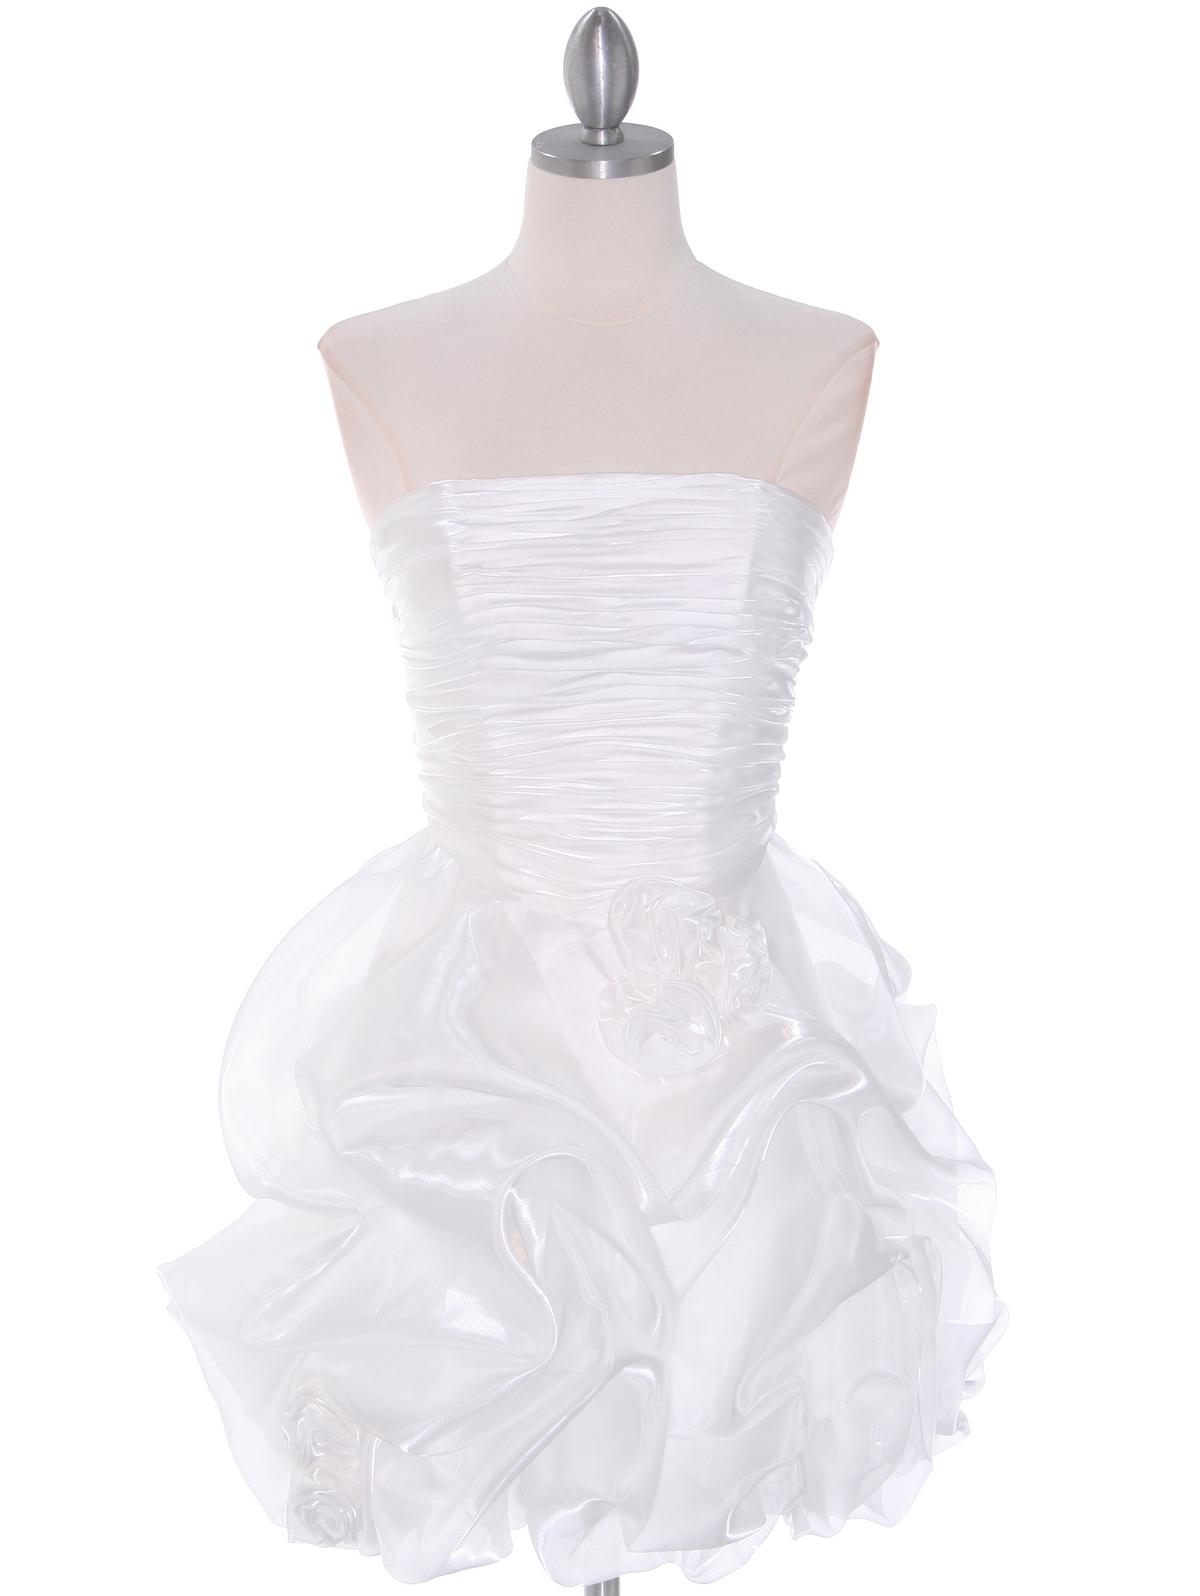 7ad57f00863 Off White Graduation Dress